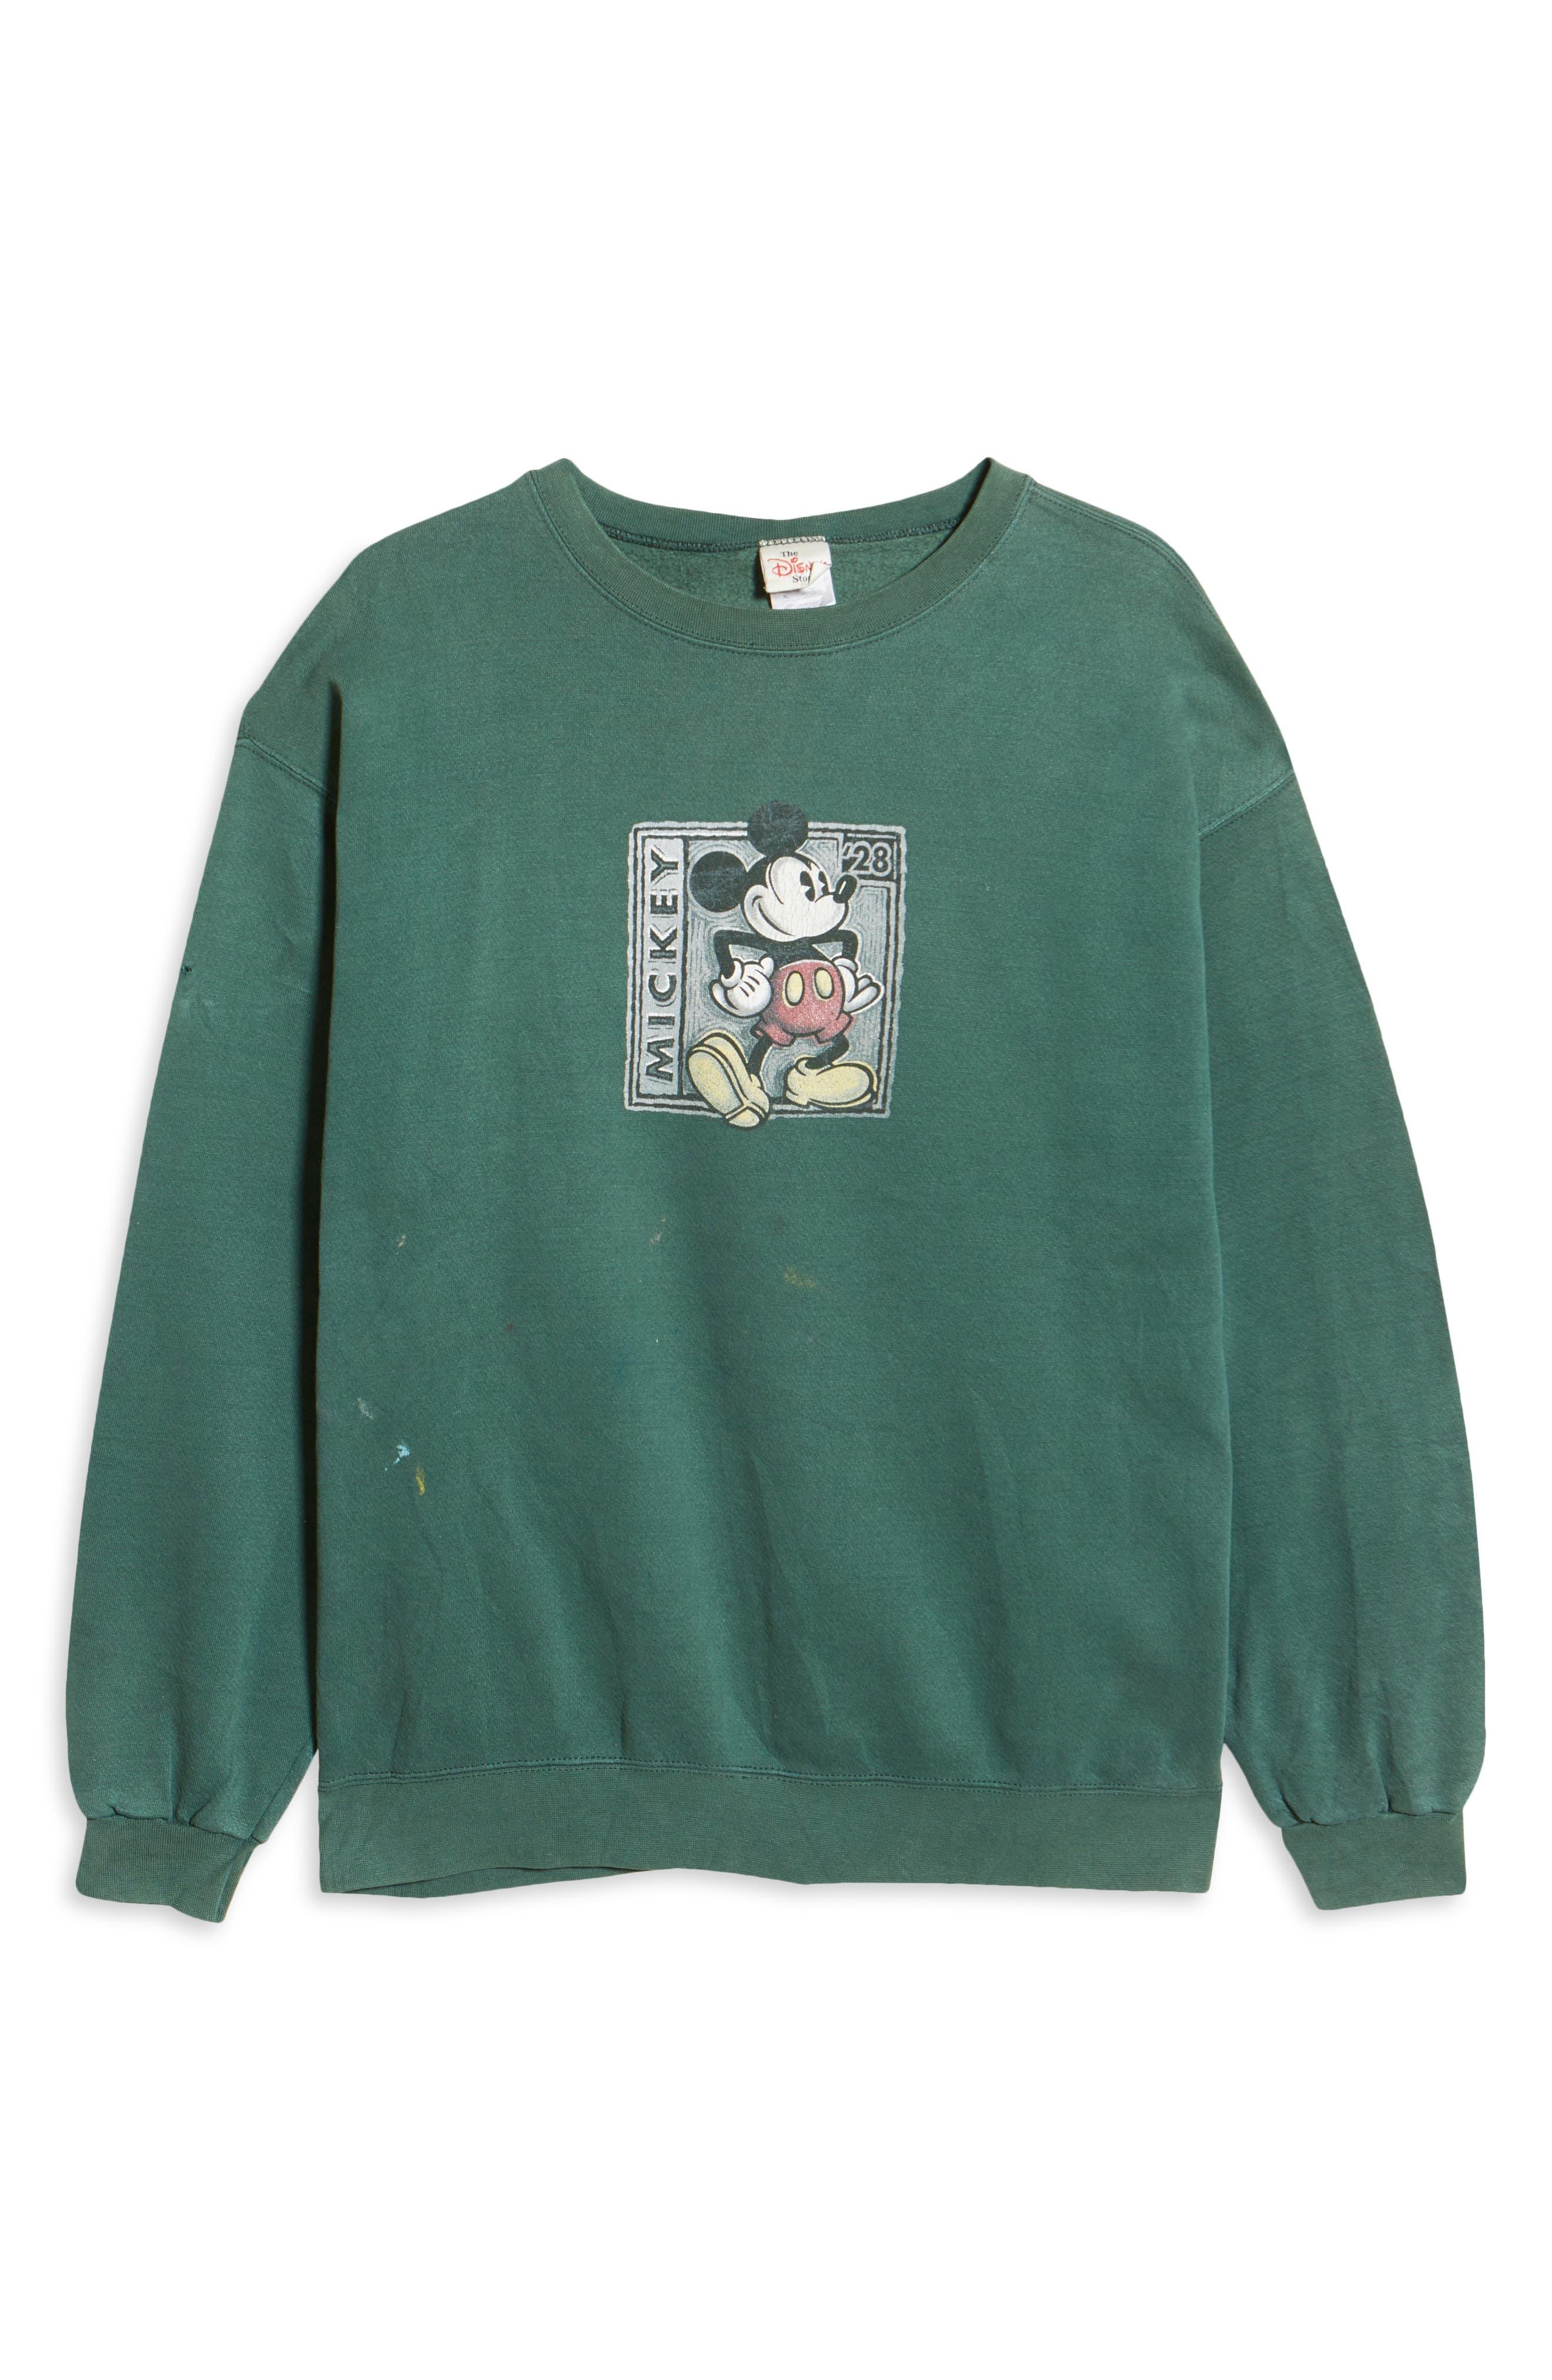 Unisex Secondhand Mickey Since 1928 Graphic Sweatshirt